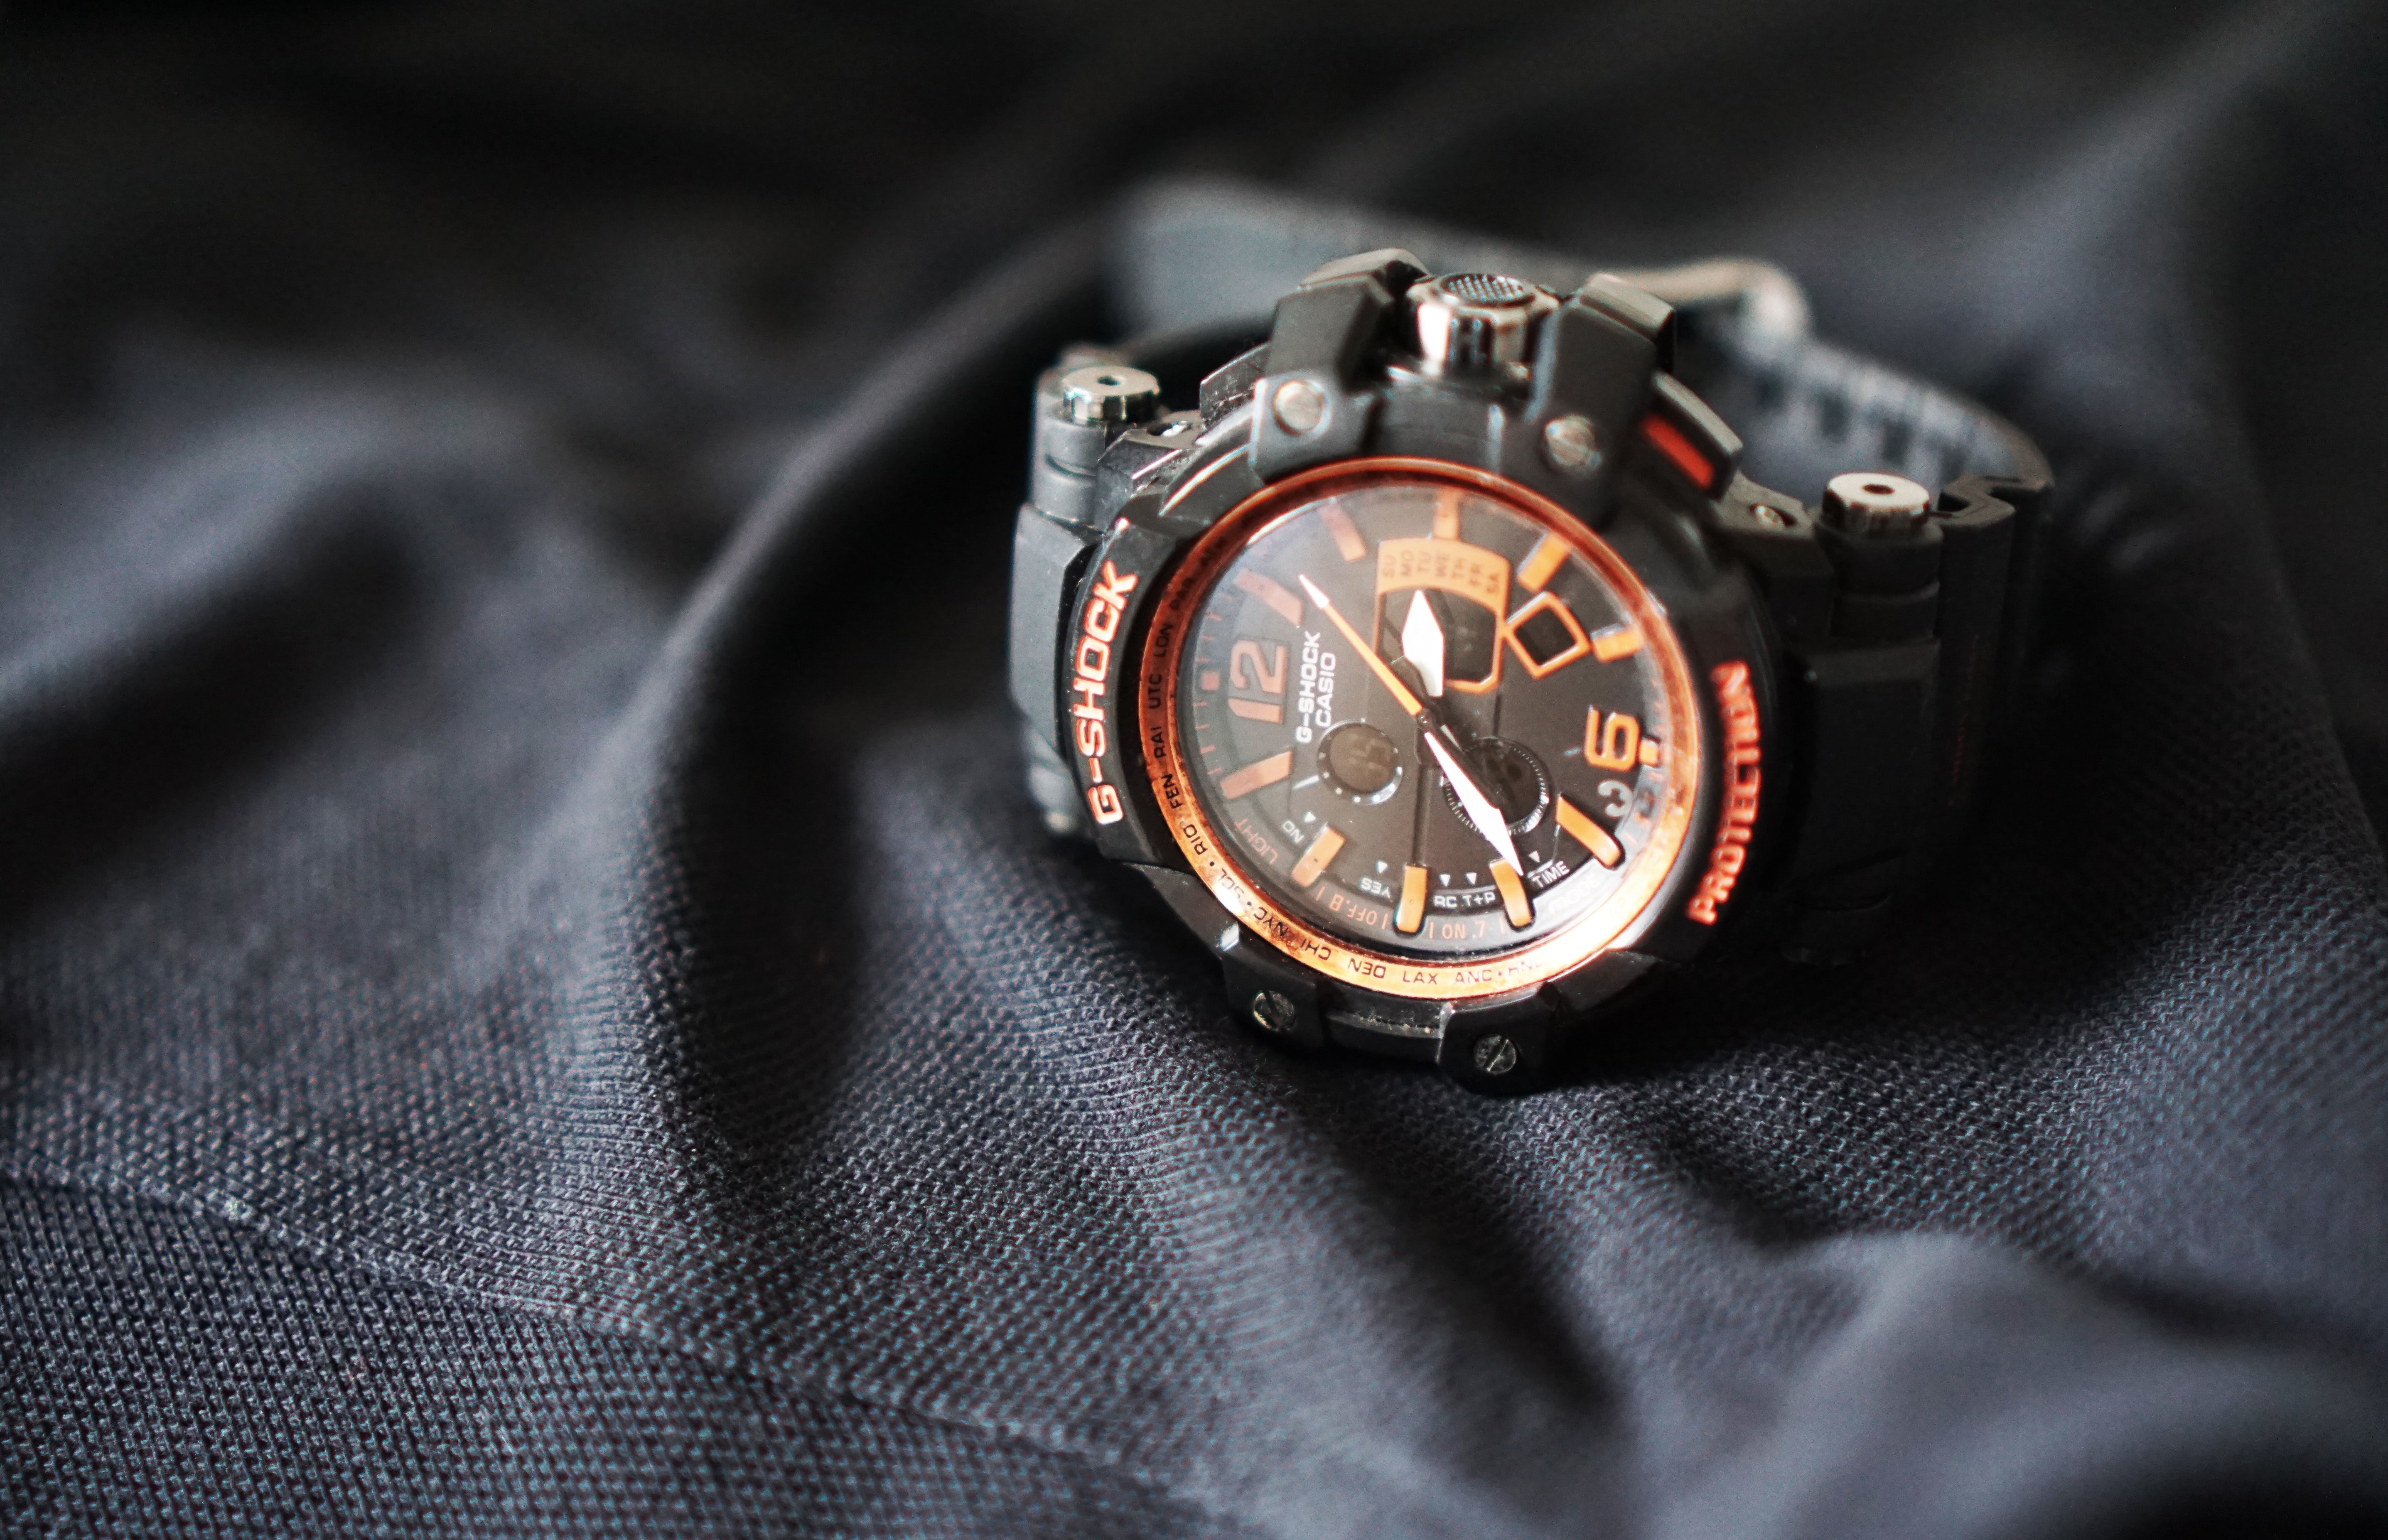 Casio g shock black leather strap round bezel chronograph watch photo